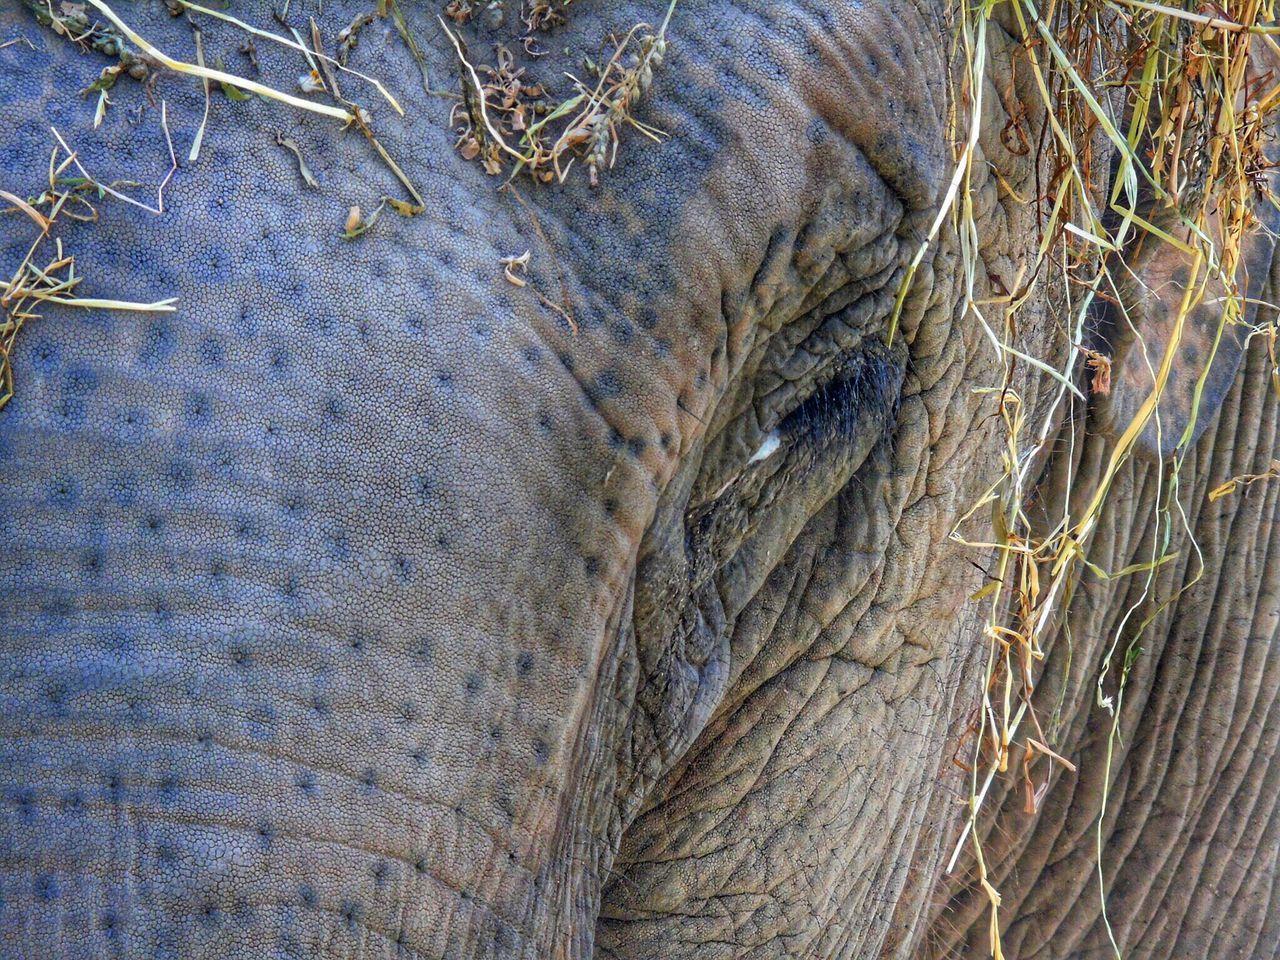 one animal, animal themes, animal wildlife, animal body part, animals in the wild, animal skin, mammal, no people, day, outdoors, close-up, nature, safari animals, african elephant